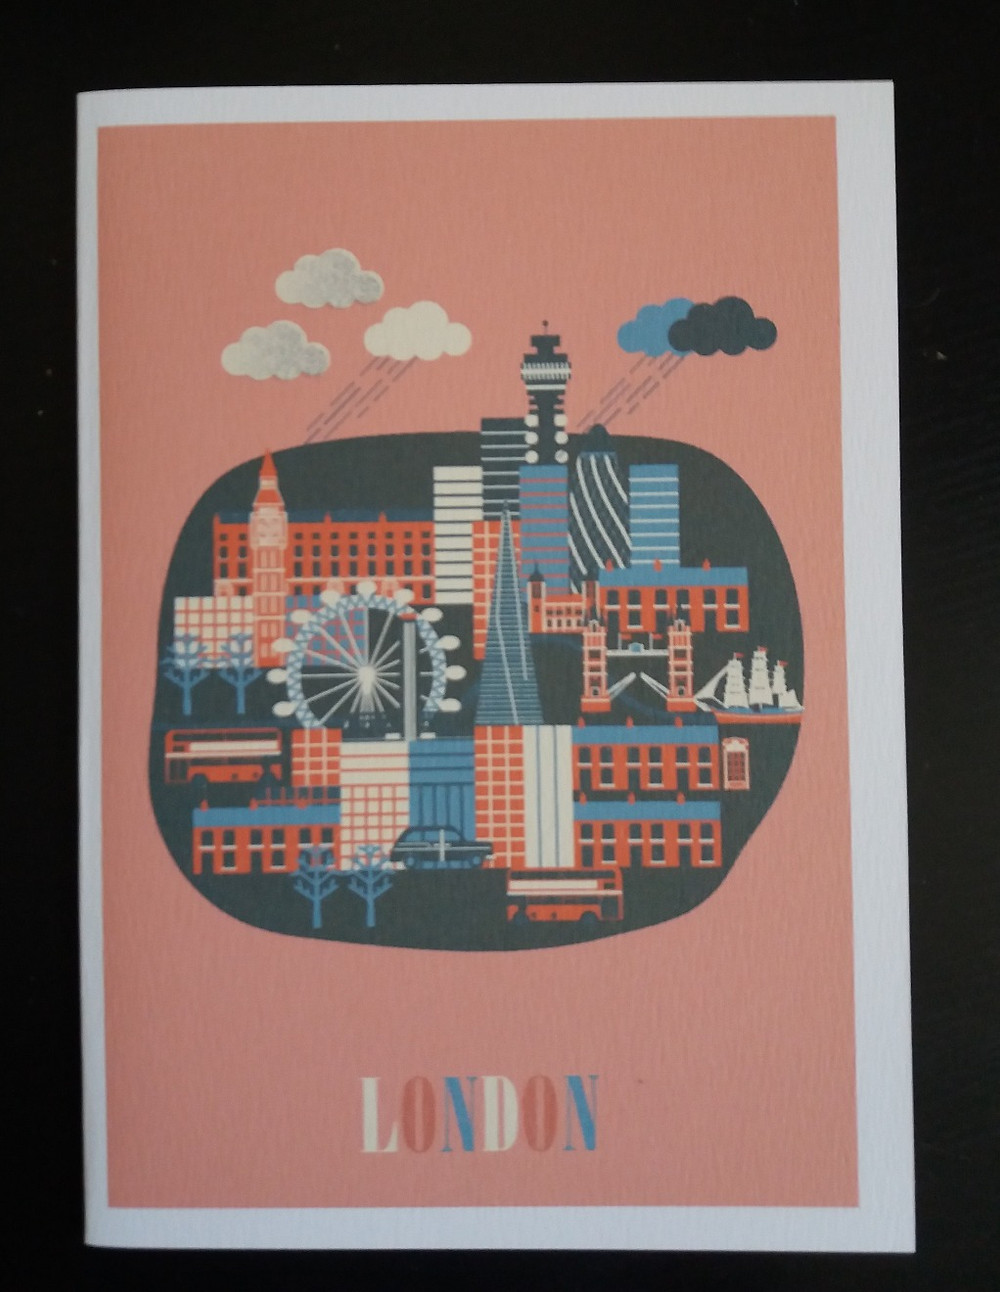 Linda Fahrlin's London card